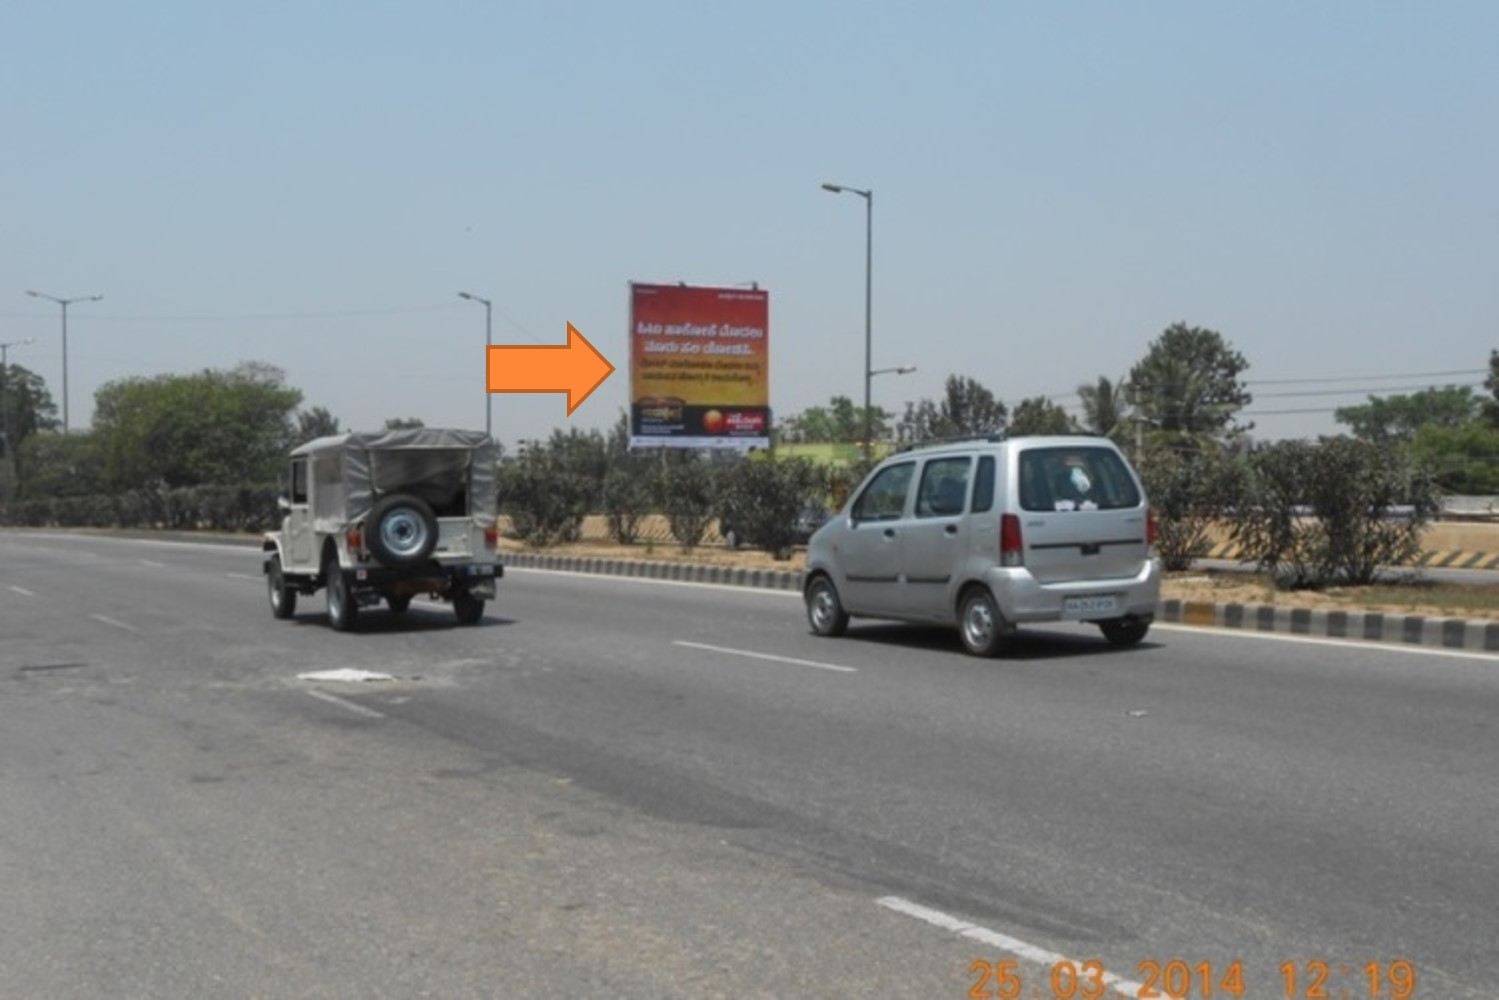 Tumkur Road Near Dassanpura Outgoing, Bangalore